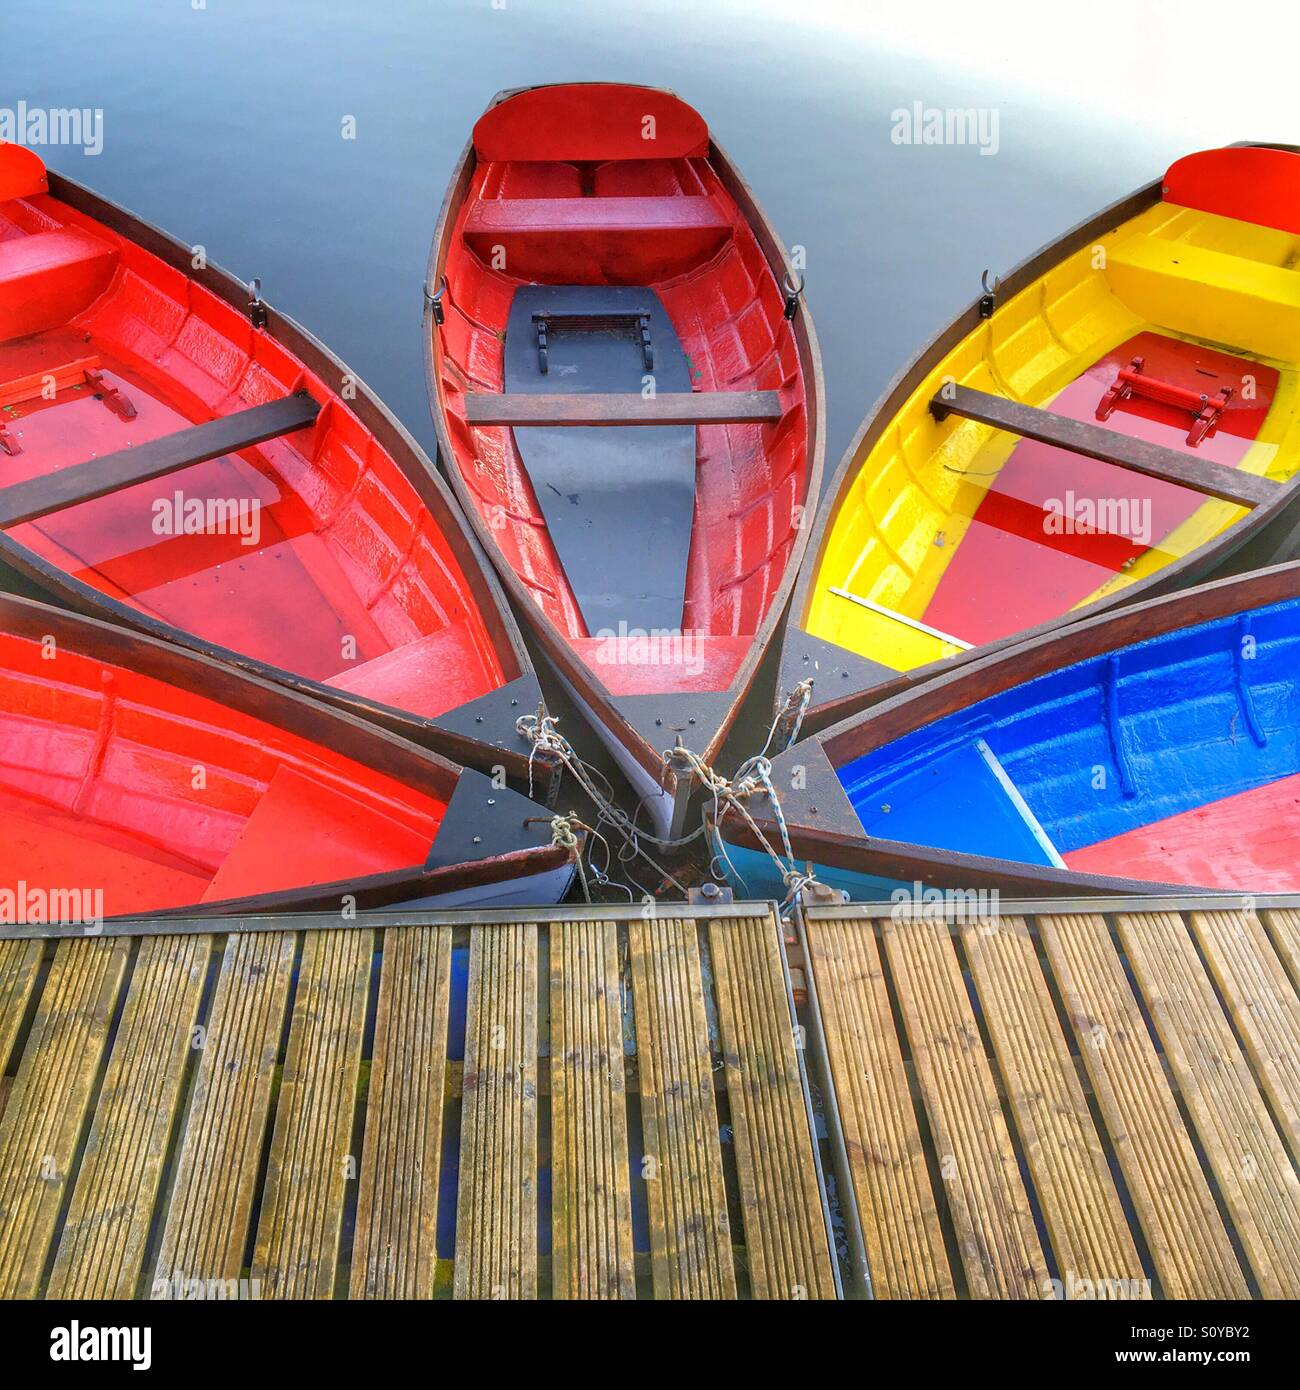 Fünf bunte Boote vertäut in einem Fan-Muster Stockbild